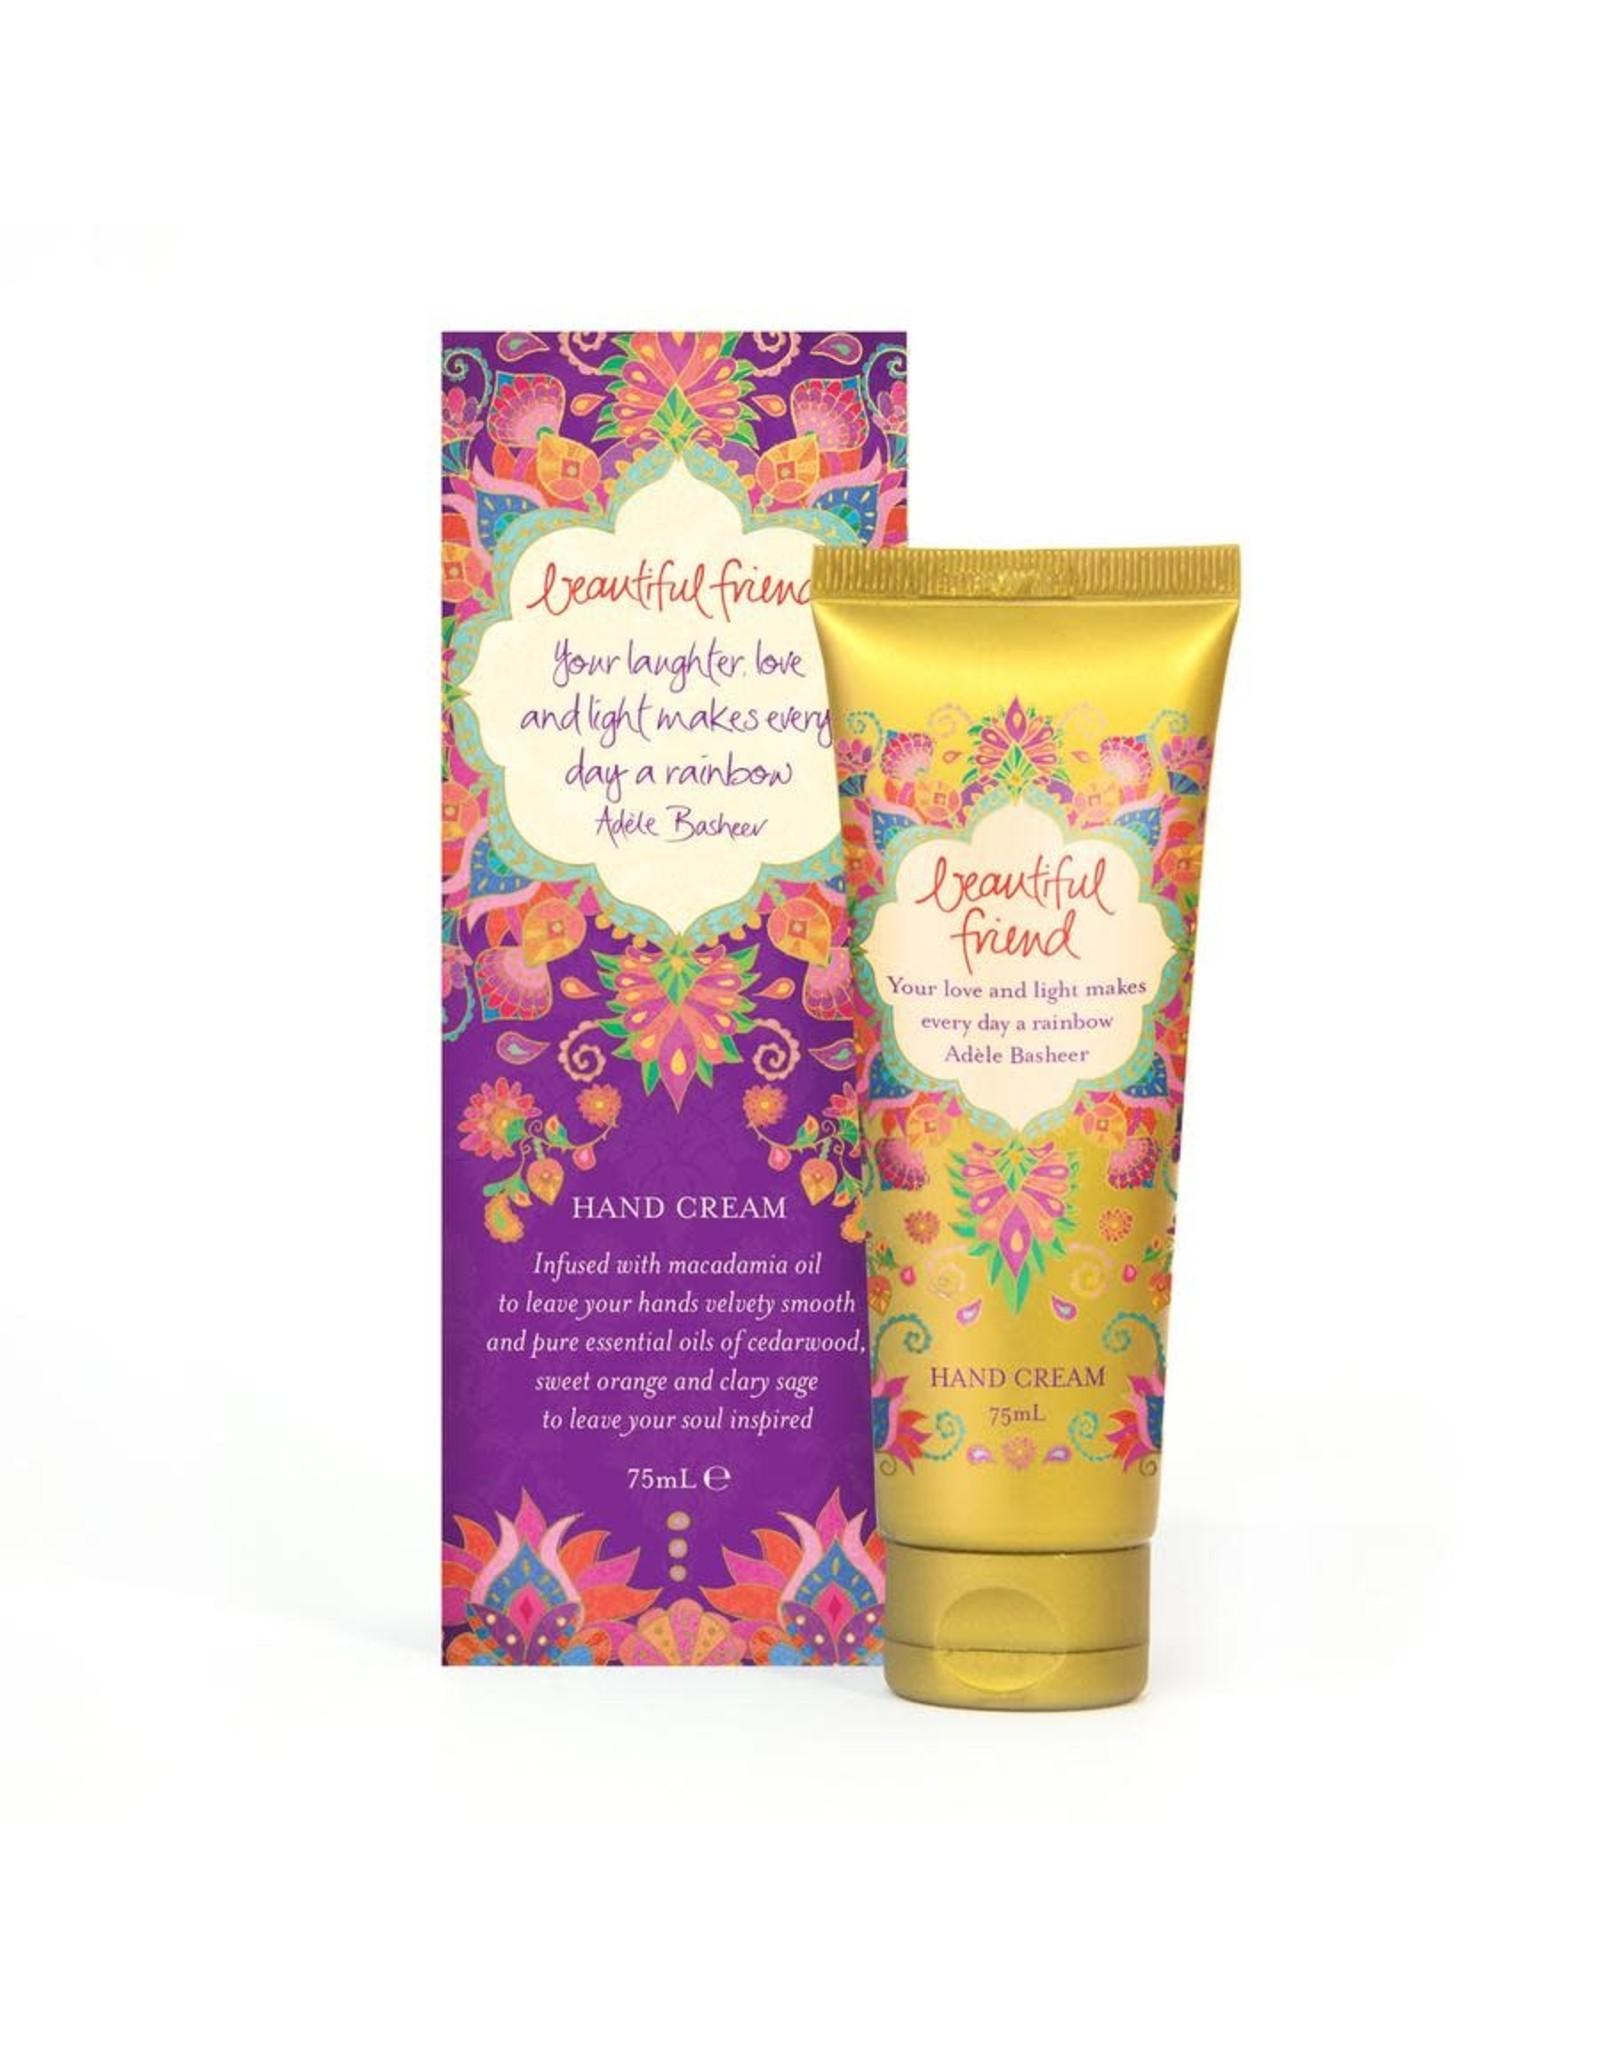 Intrinsic Beautiful Friend Hand Cream 75ml